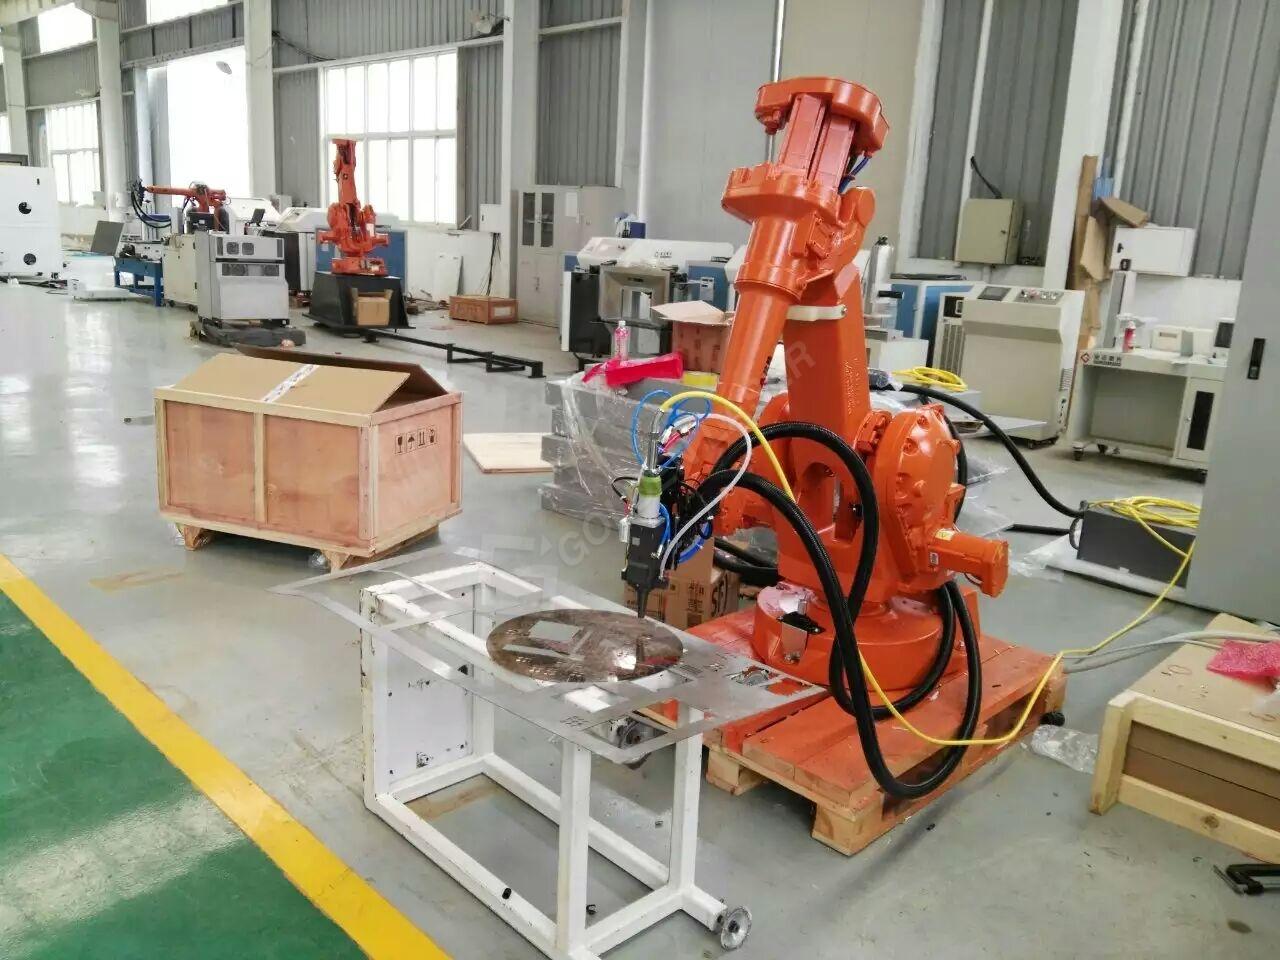 Ordinary Discount Laser Tube Cutting Machine Price - Fiber Laser Robot Arm 3D Cutting Tube / Pipe – Vtop Fiber Laser